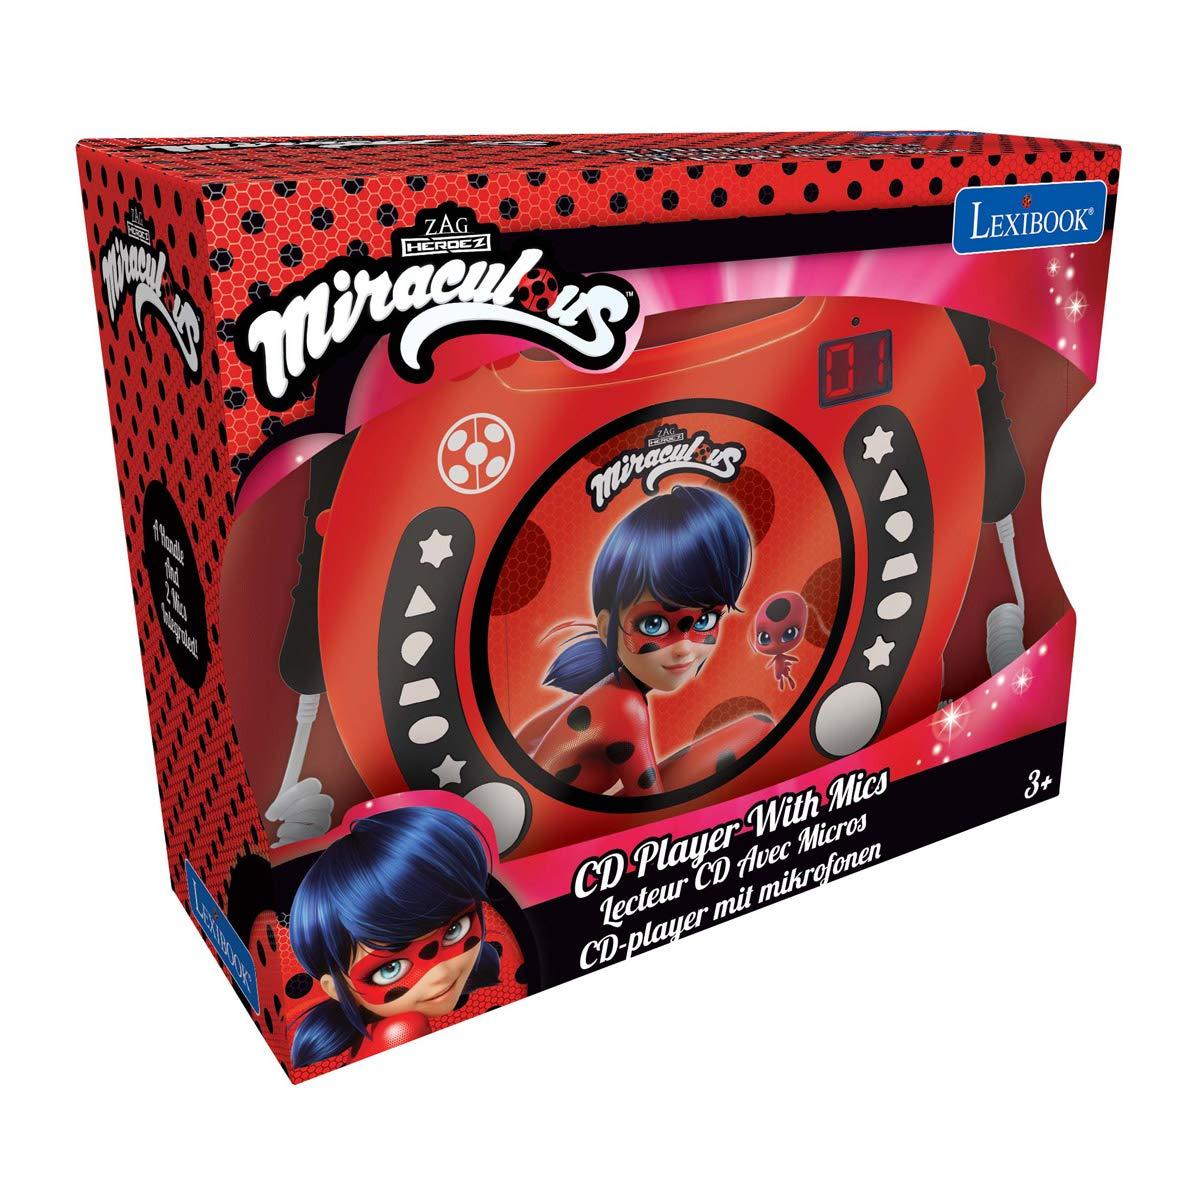 LEXiBOOK Miraculous Ladybug Radio CD, Programming Function, Headphones Jack, for Kids, with Power Supply or Batteries, Red/Black, RCDK100MI by LEXiBOOK (Image #6)